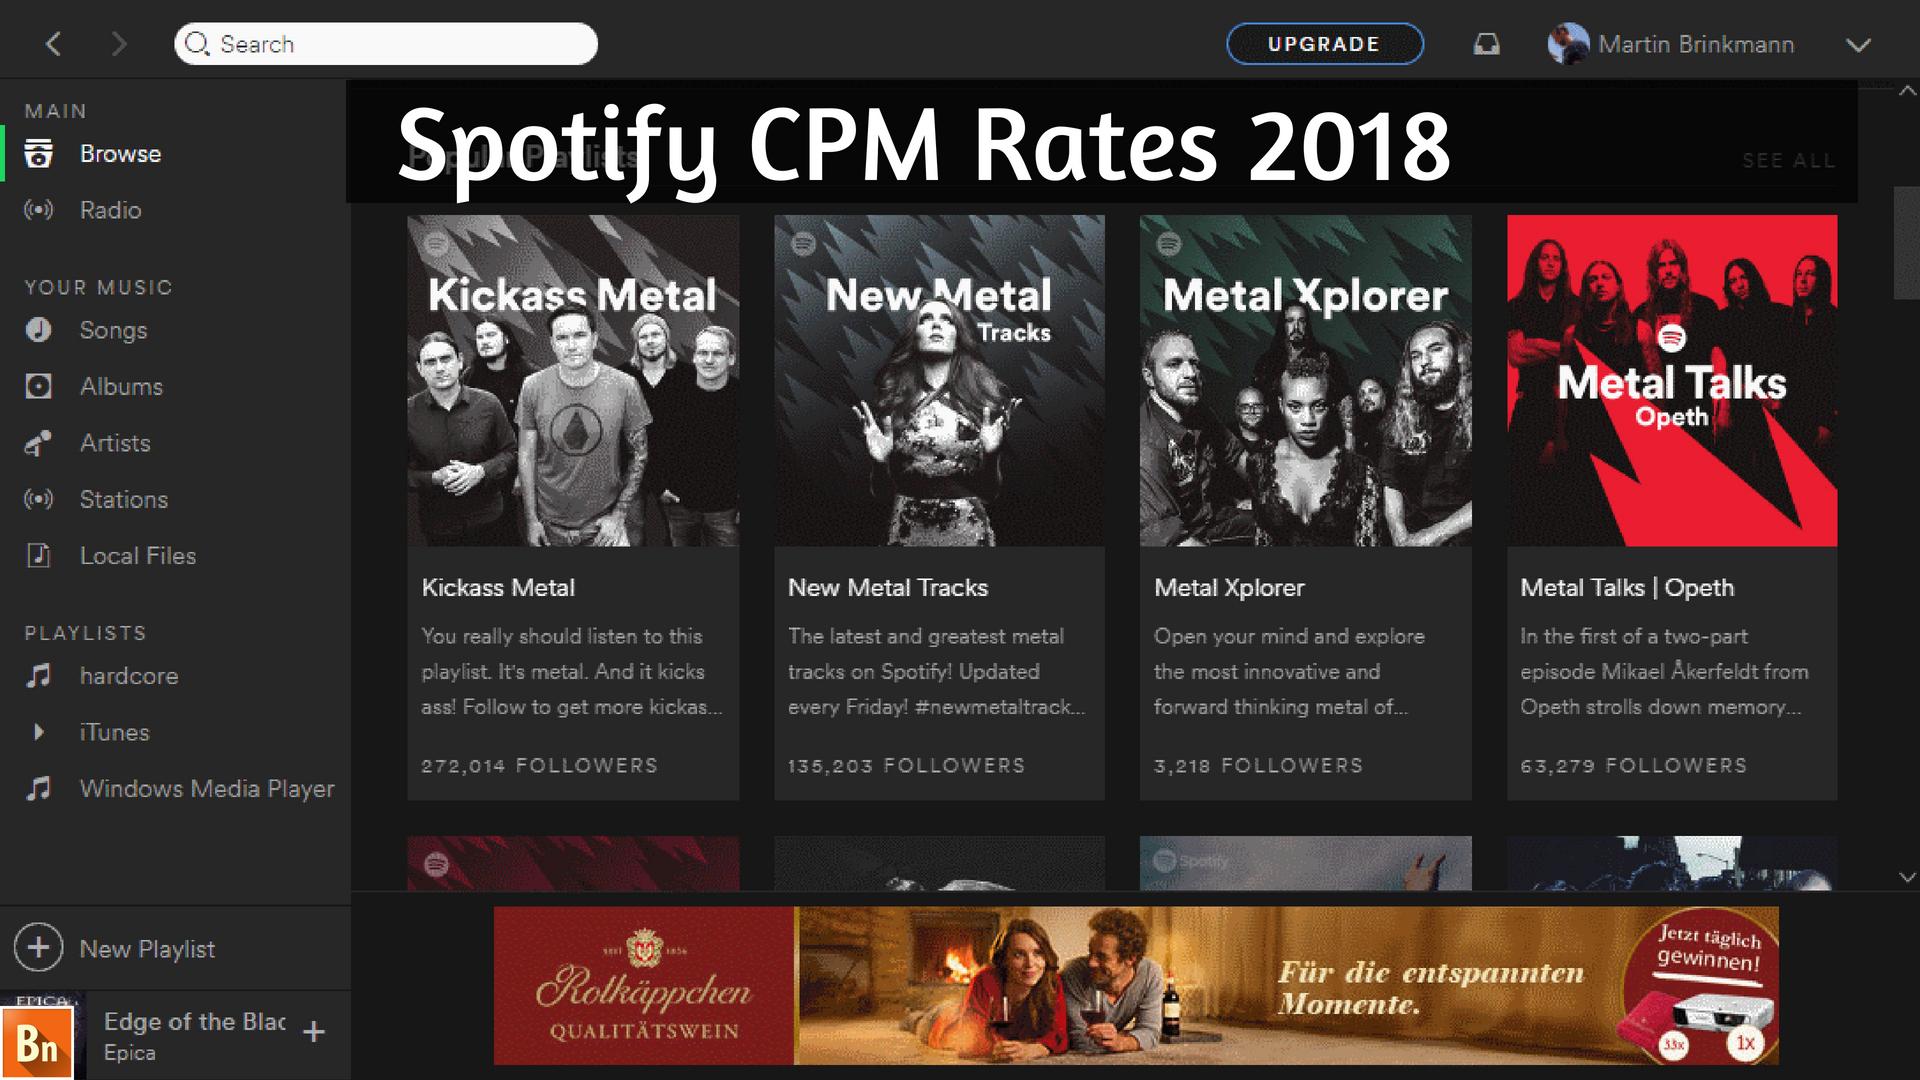 Spotify CPM Rates 2019